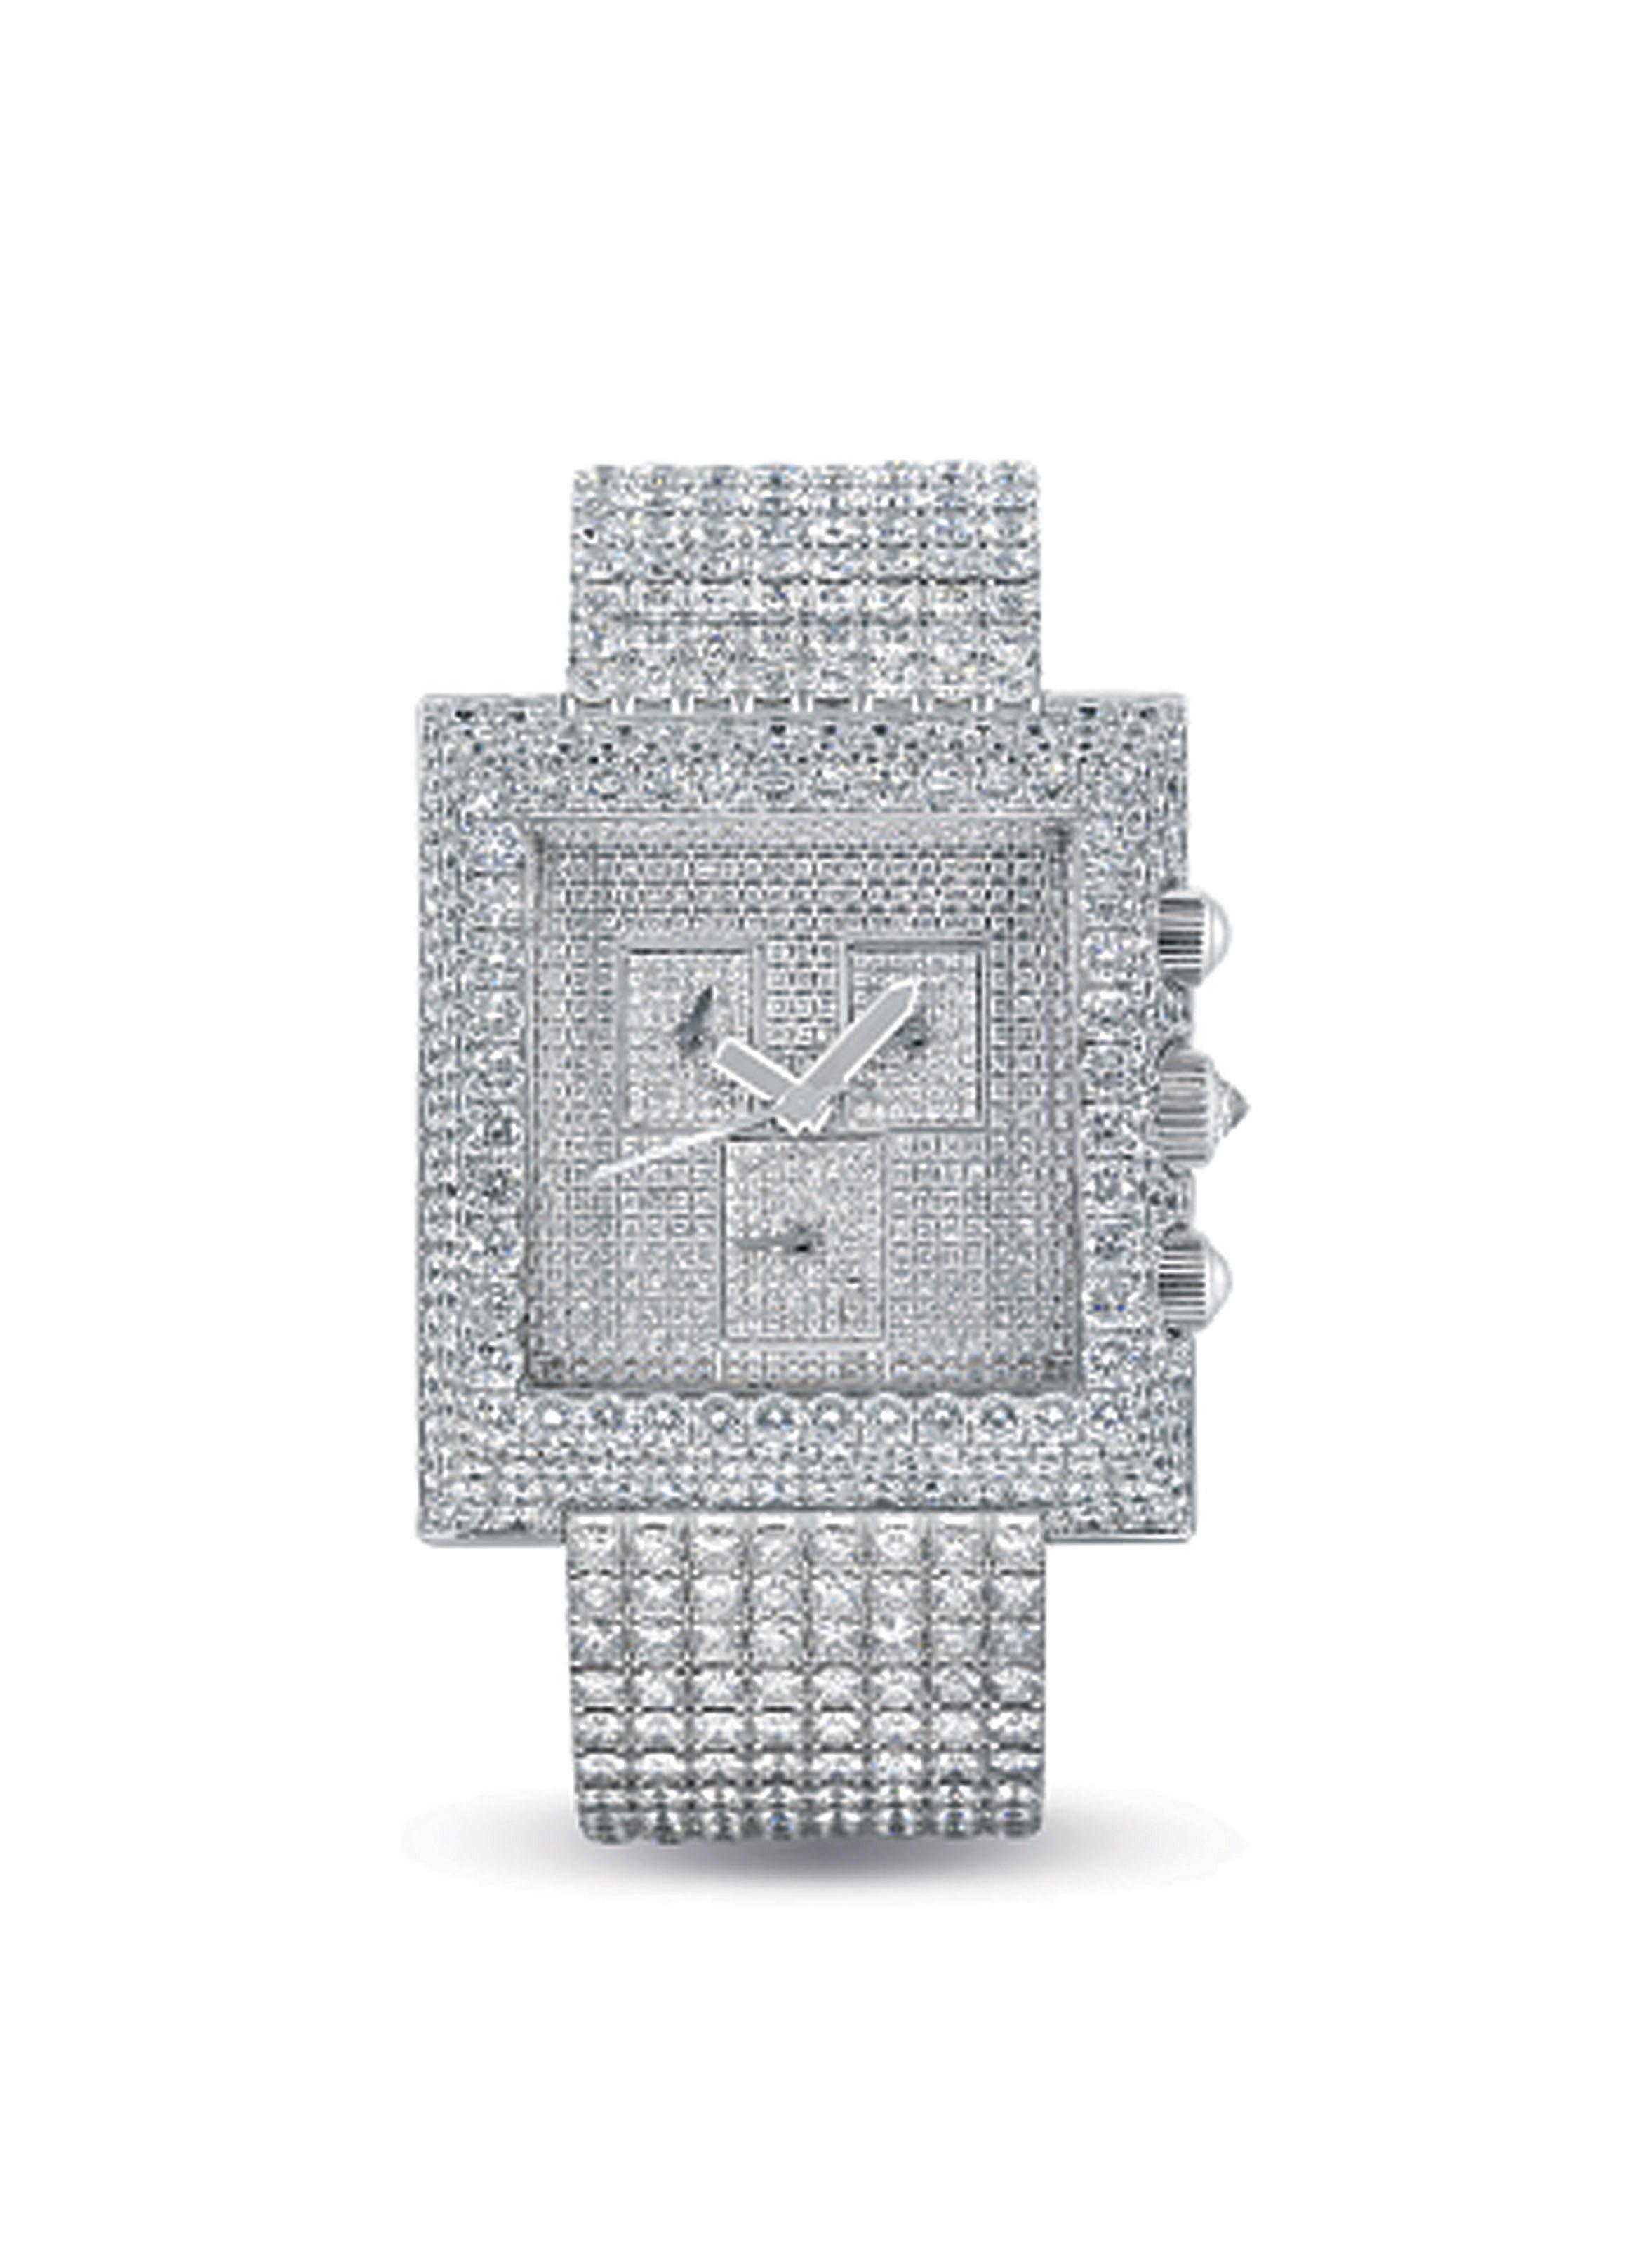 CORUM. AN IMPRESSIVE AND VERY RARE 18K WHITE GOLD AND DIAMOND-SET SQUARE CHRONOGRAPH BRACELET WATCH